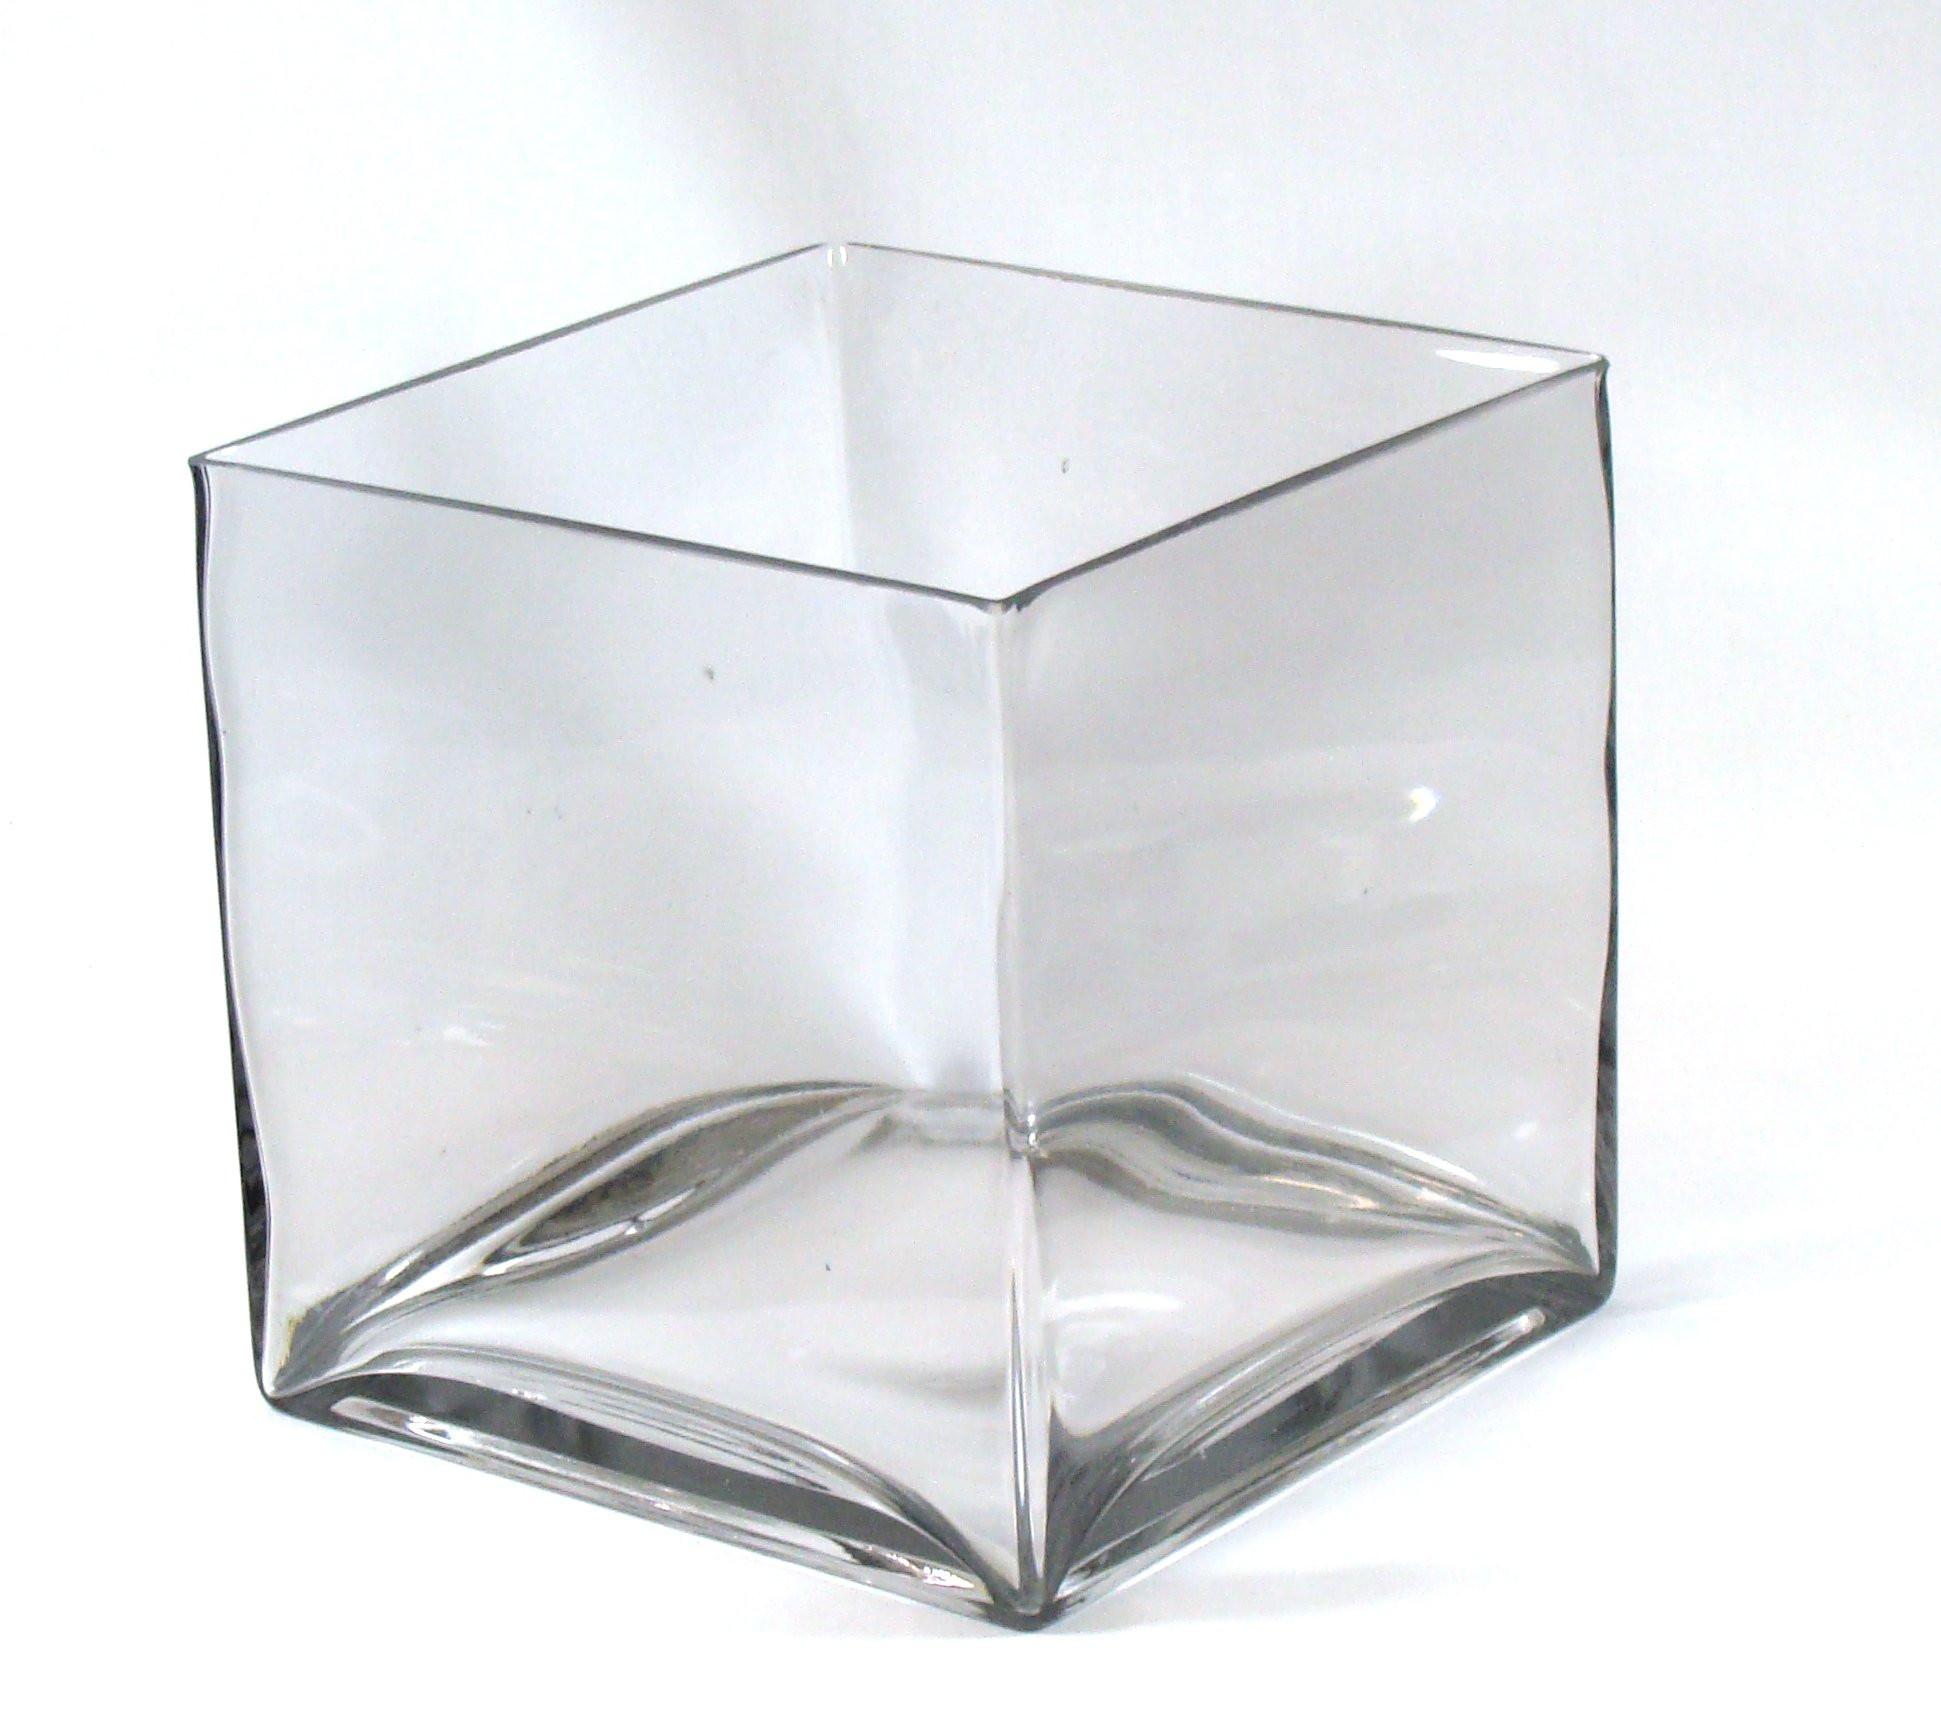 flat round glass vase of buy 8 inch round large glass vase 8 clear cylinder oversize regarding 8 square large glass vase 8 inch clear cube oversize centerpiece 8x8x8 candleholder